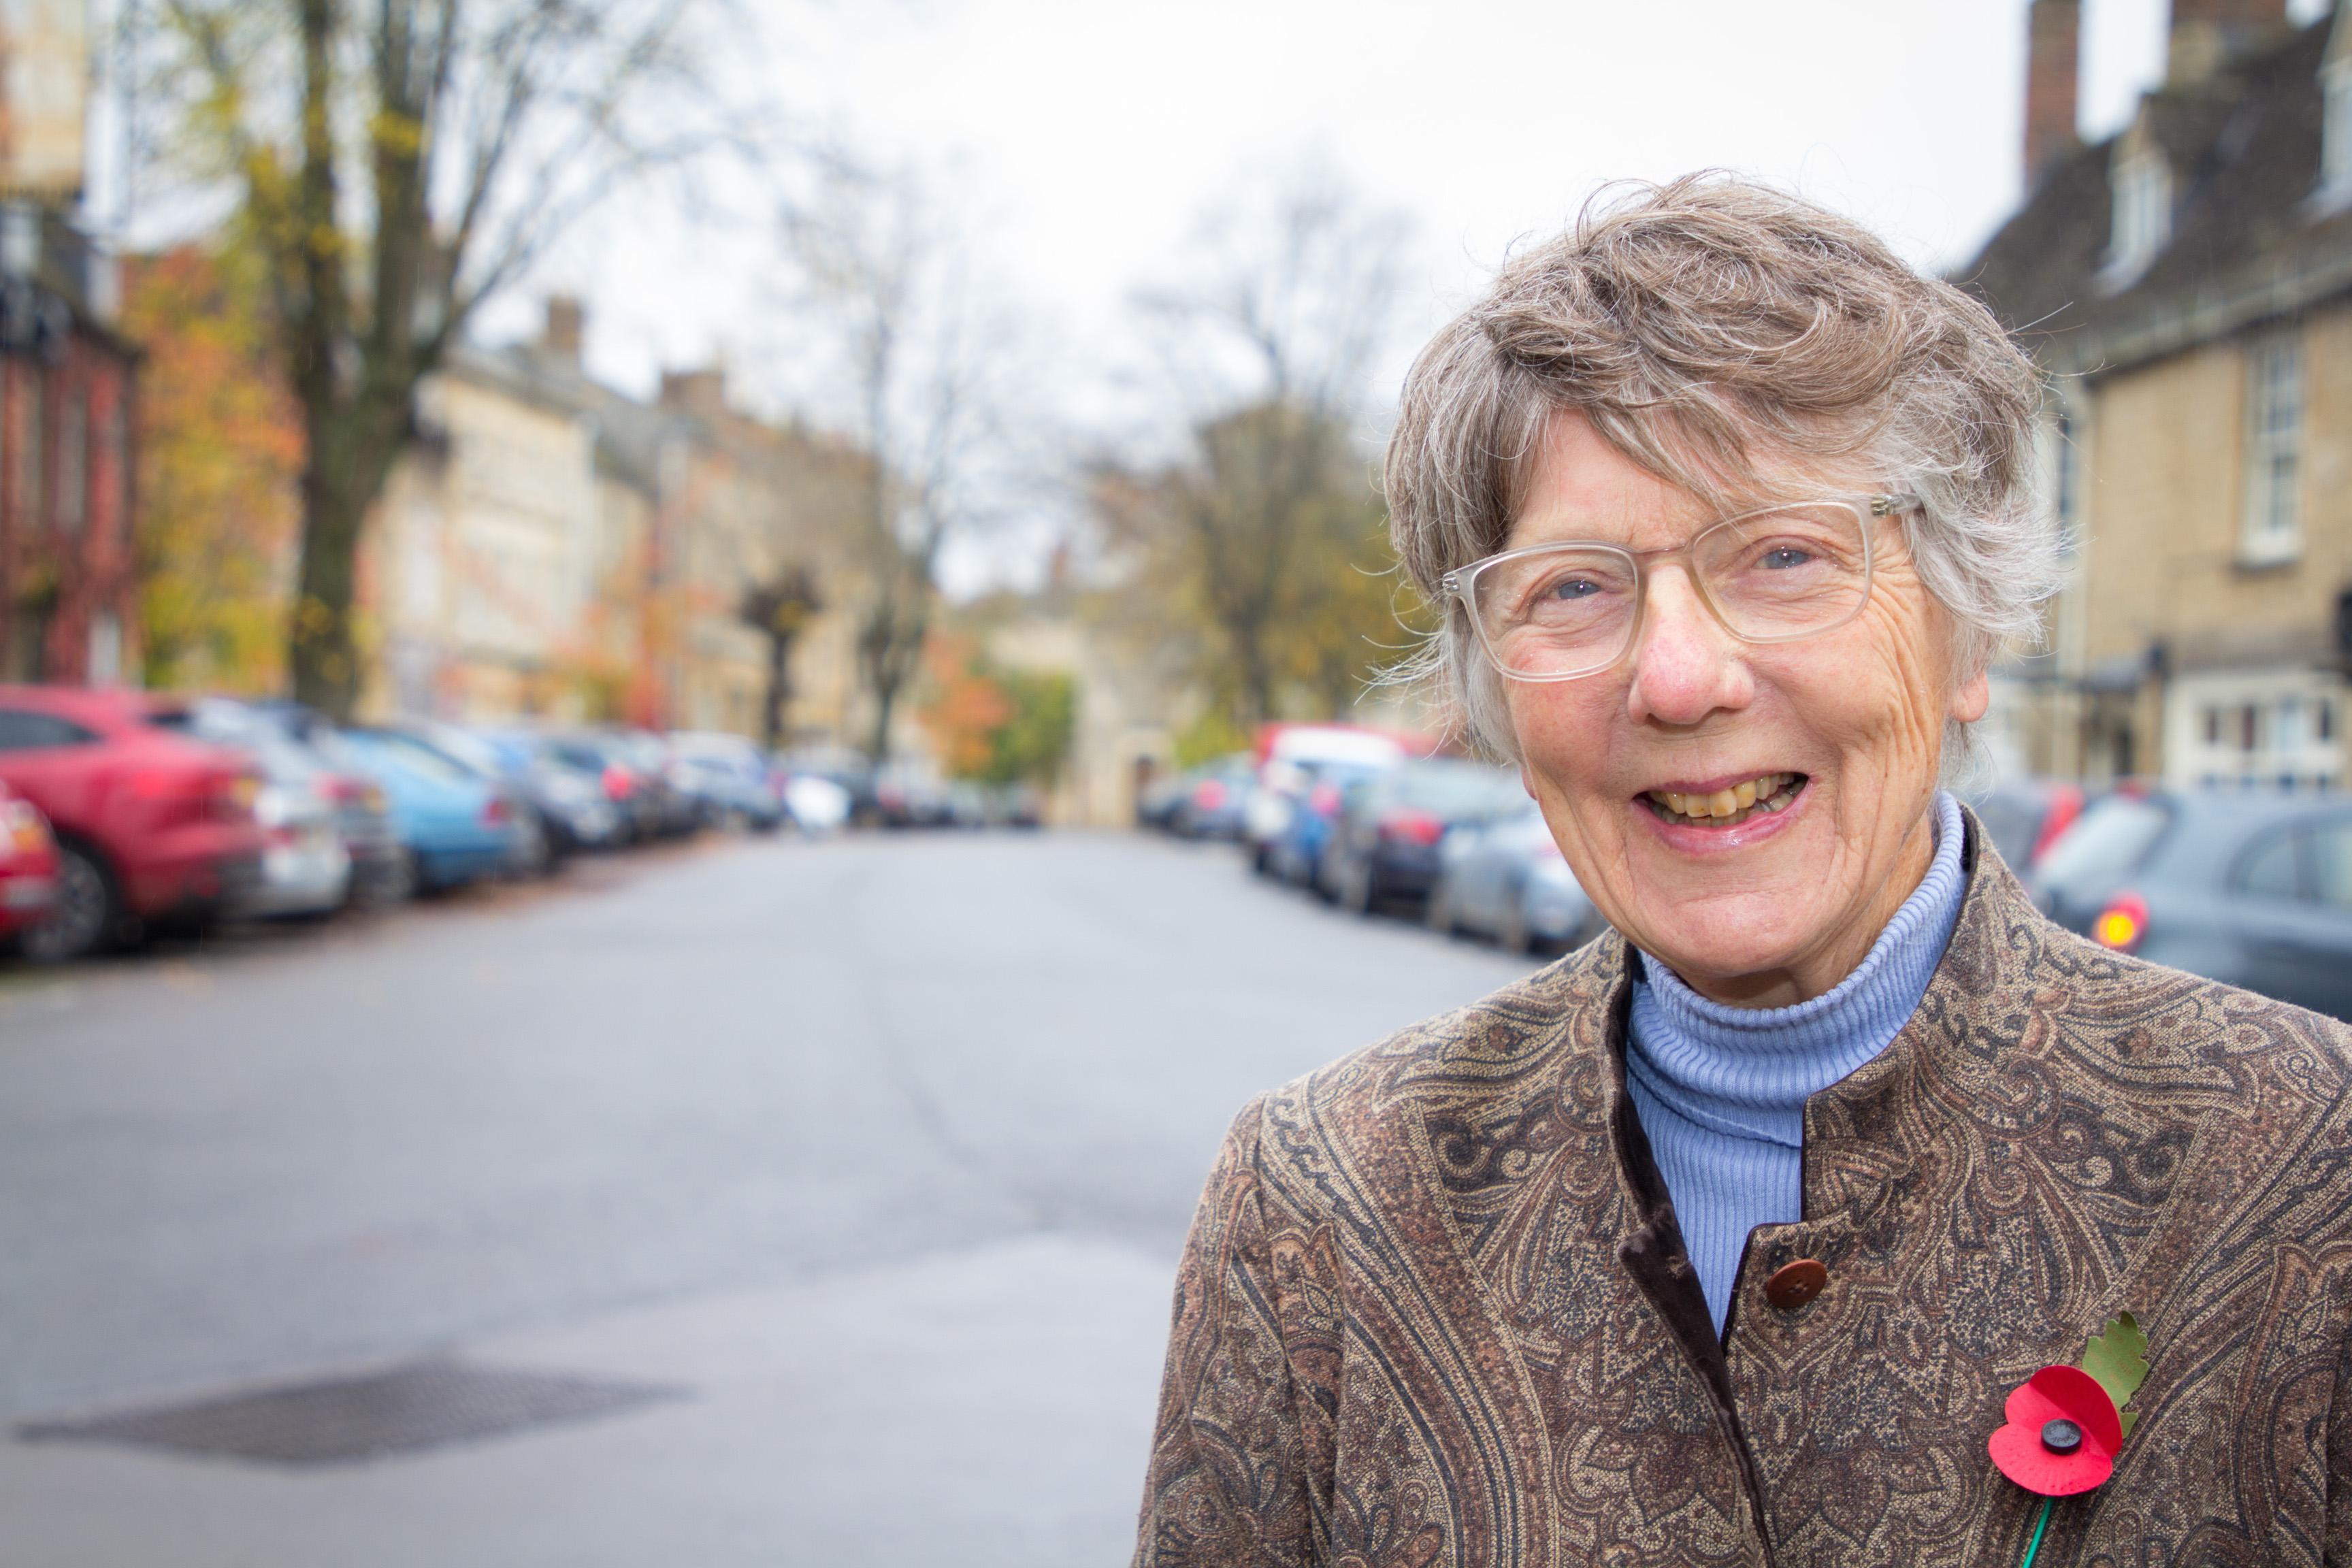 Woodstock and Bladon - Dr Elizabeth Poskitt